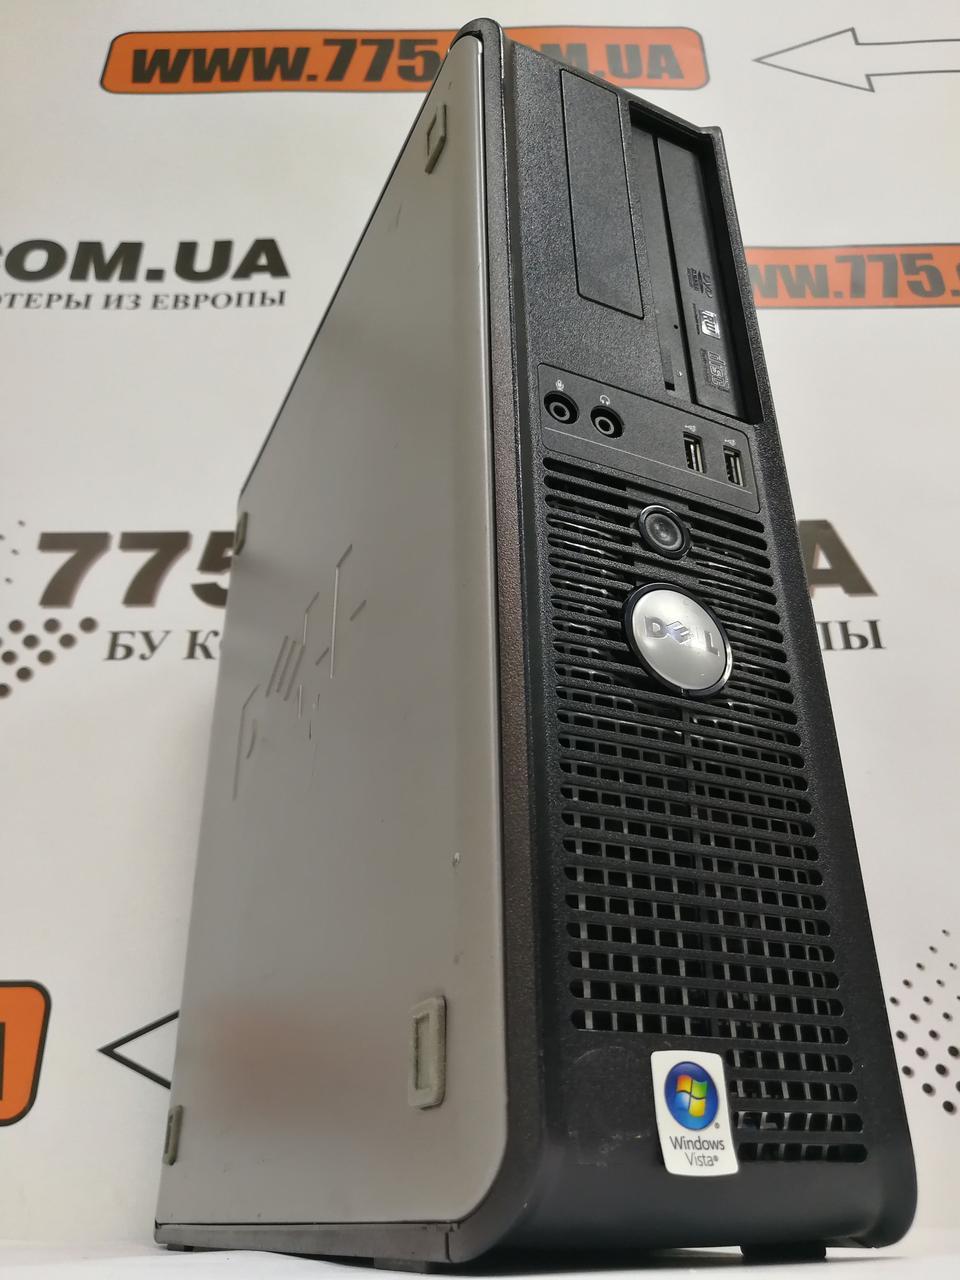 Компьютер Dell OptiPlex 760 (Desktop), Intel Core2Quad Q8200 2.33GHz, RAM 8ГБ, HDD 500ГБ